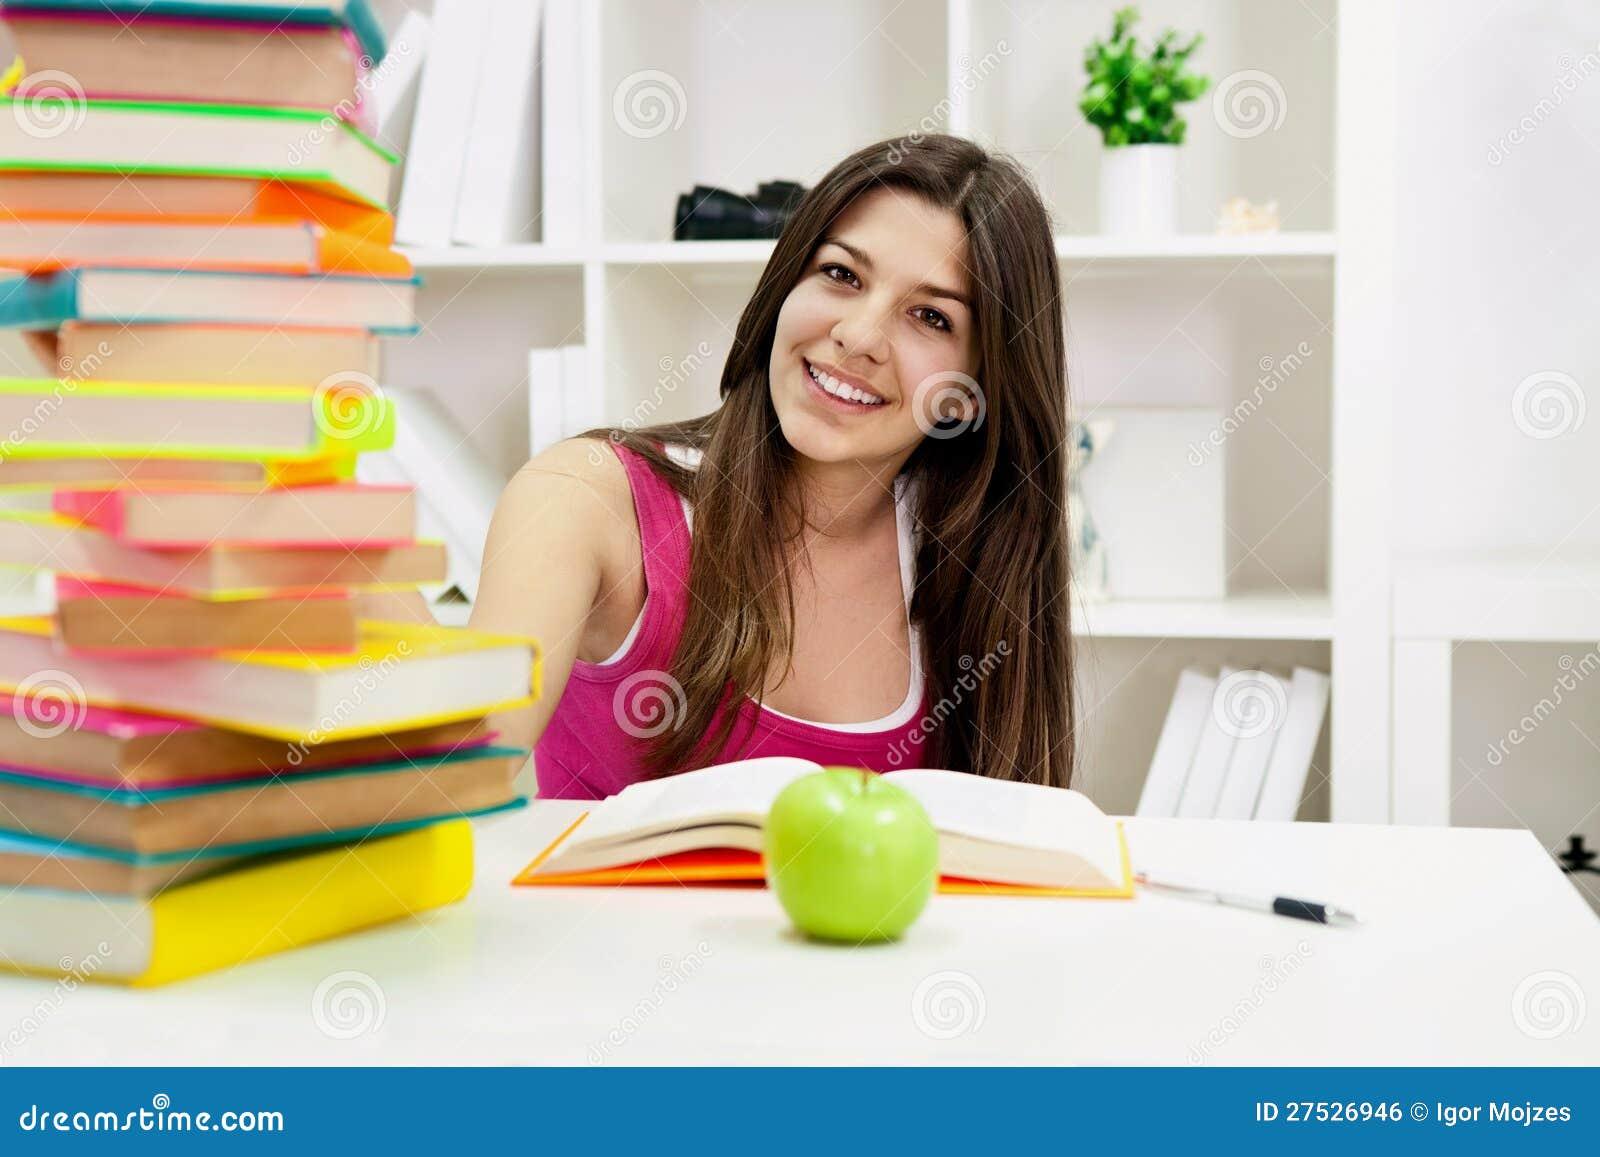 Portrait of cute student